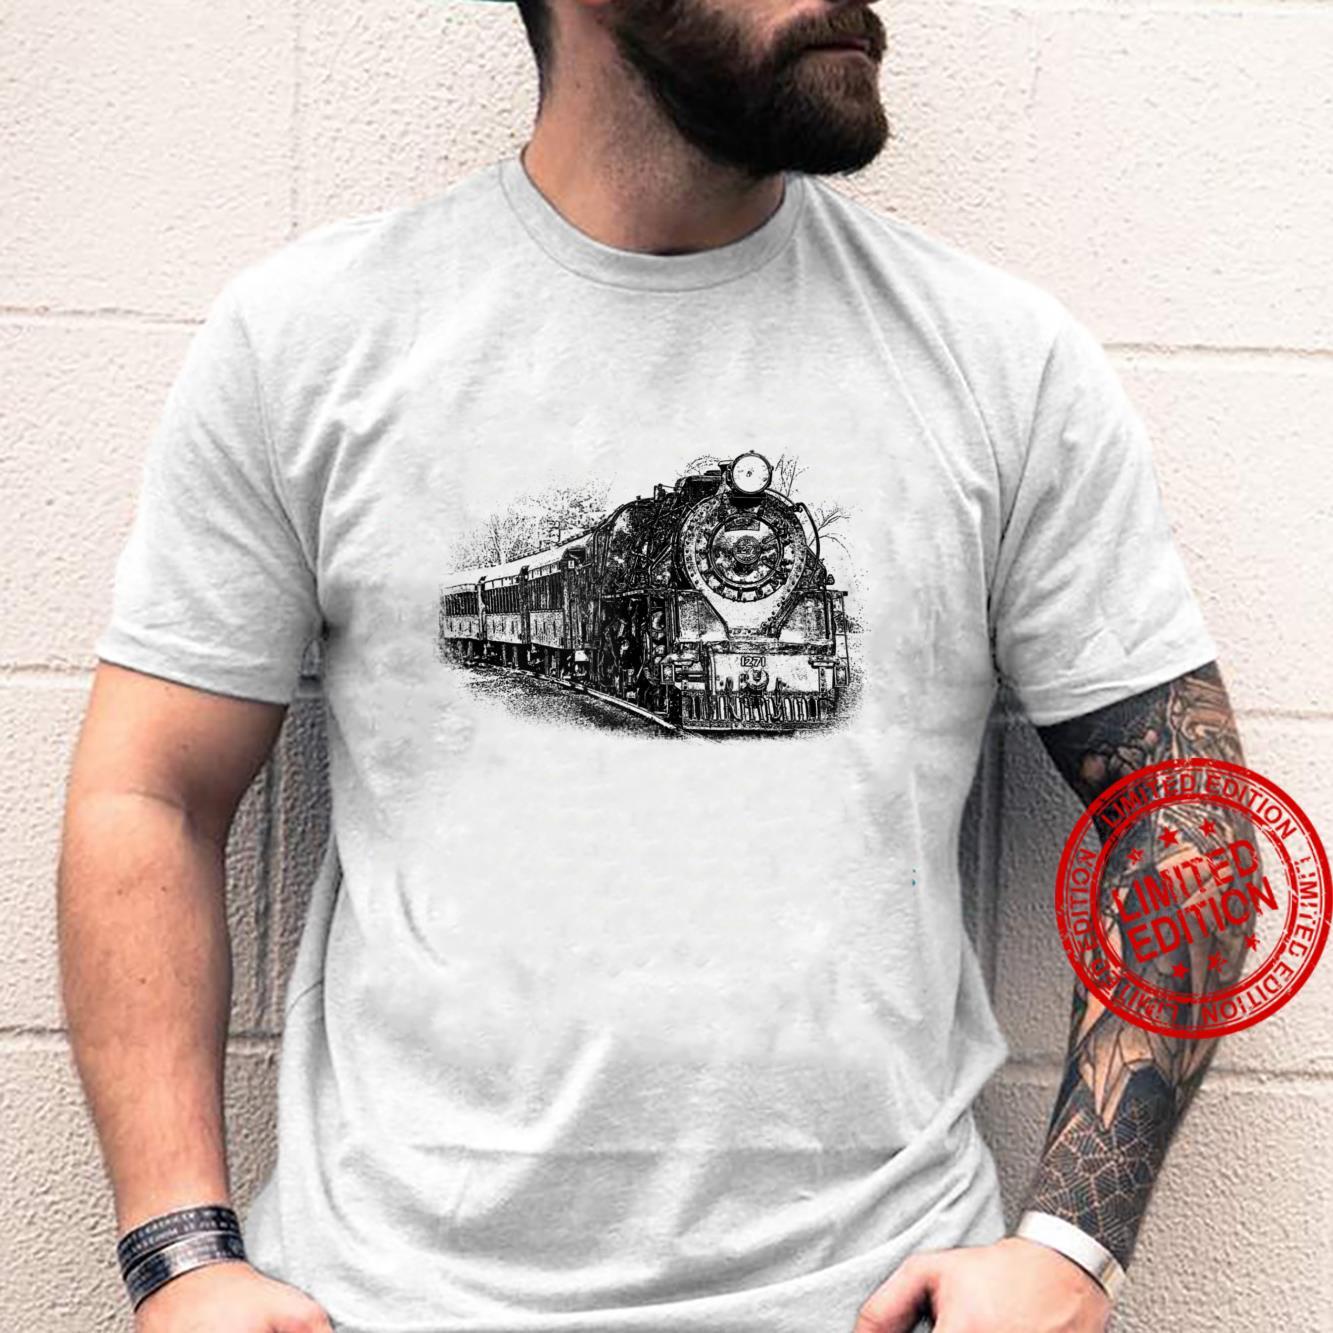 Locomotive and Train Enthusiasts Shirt